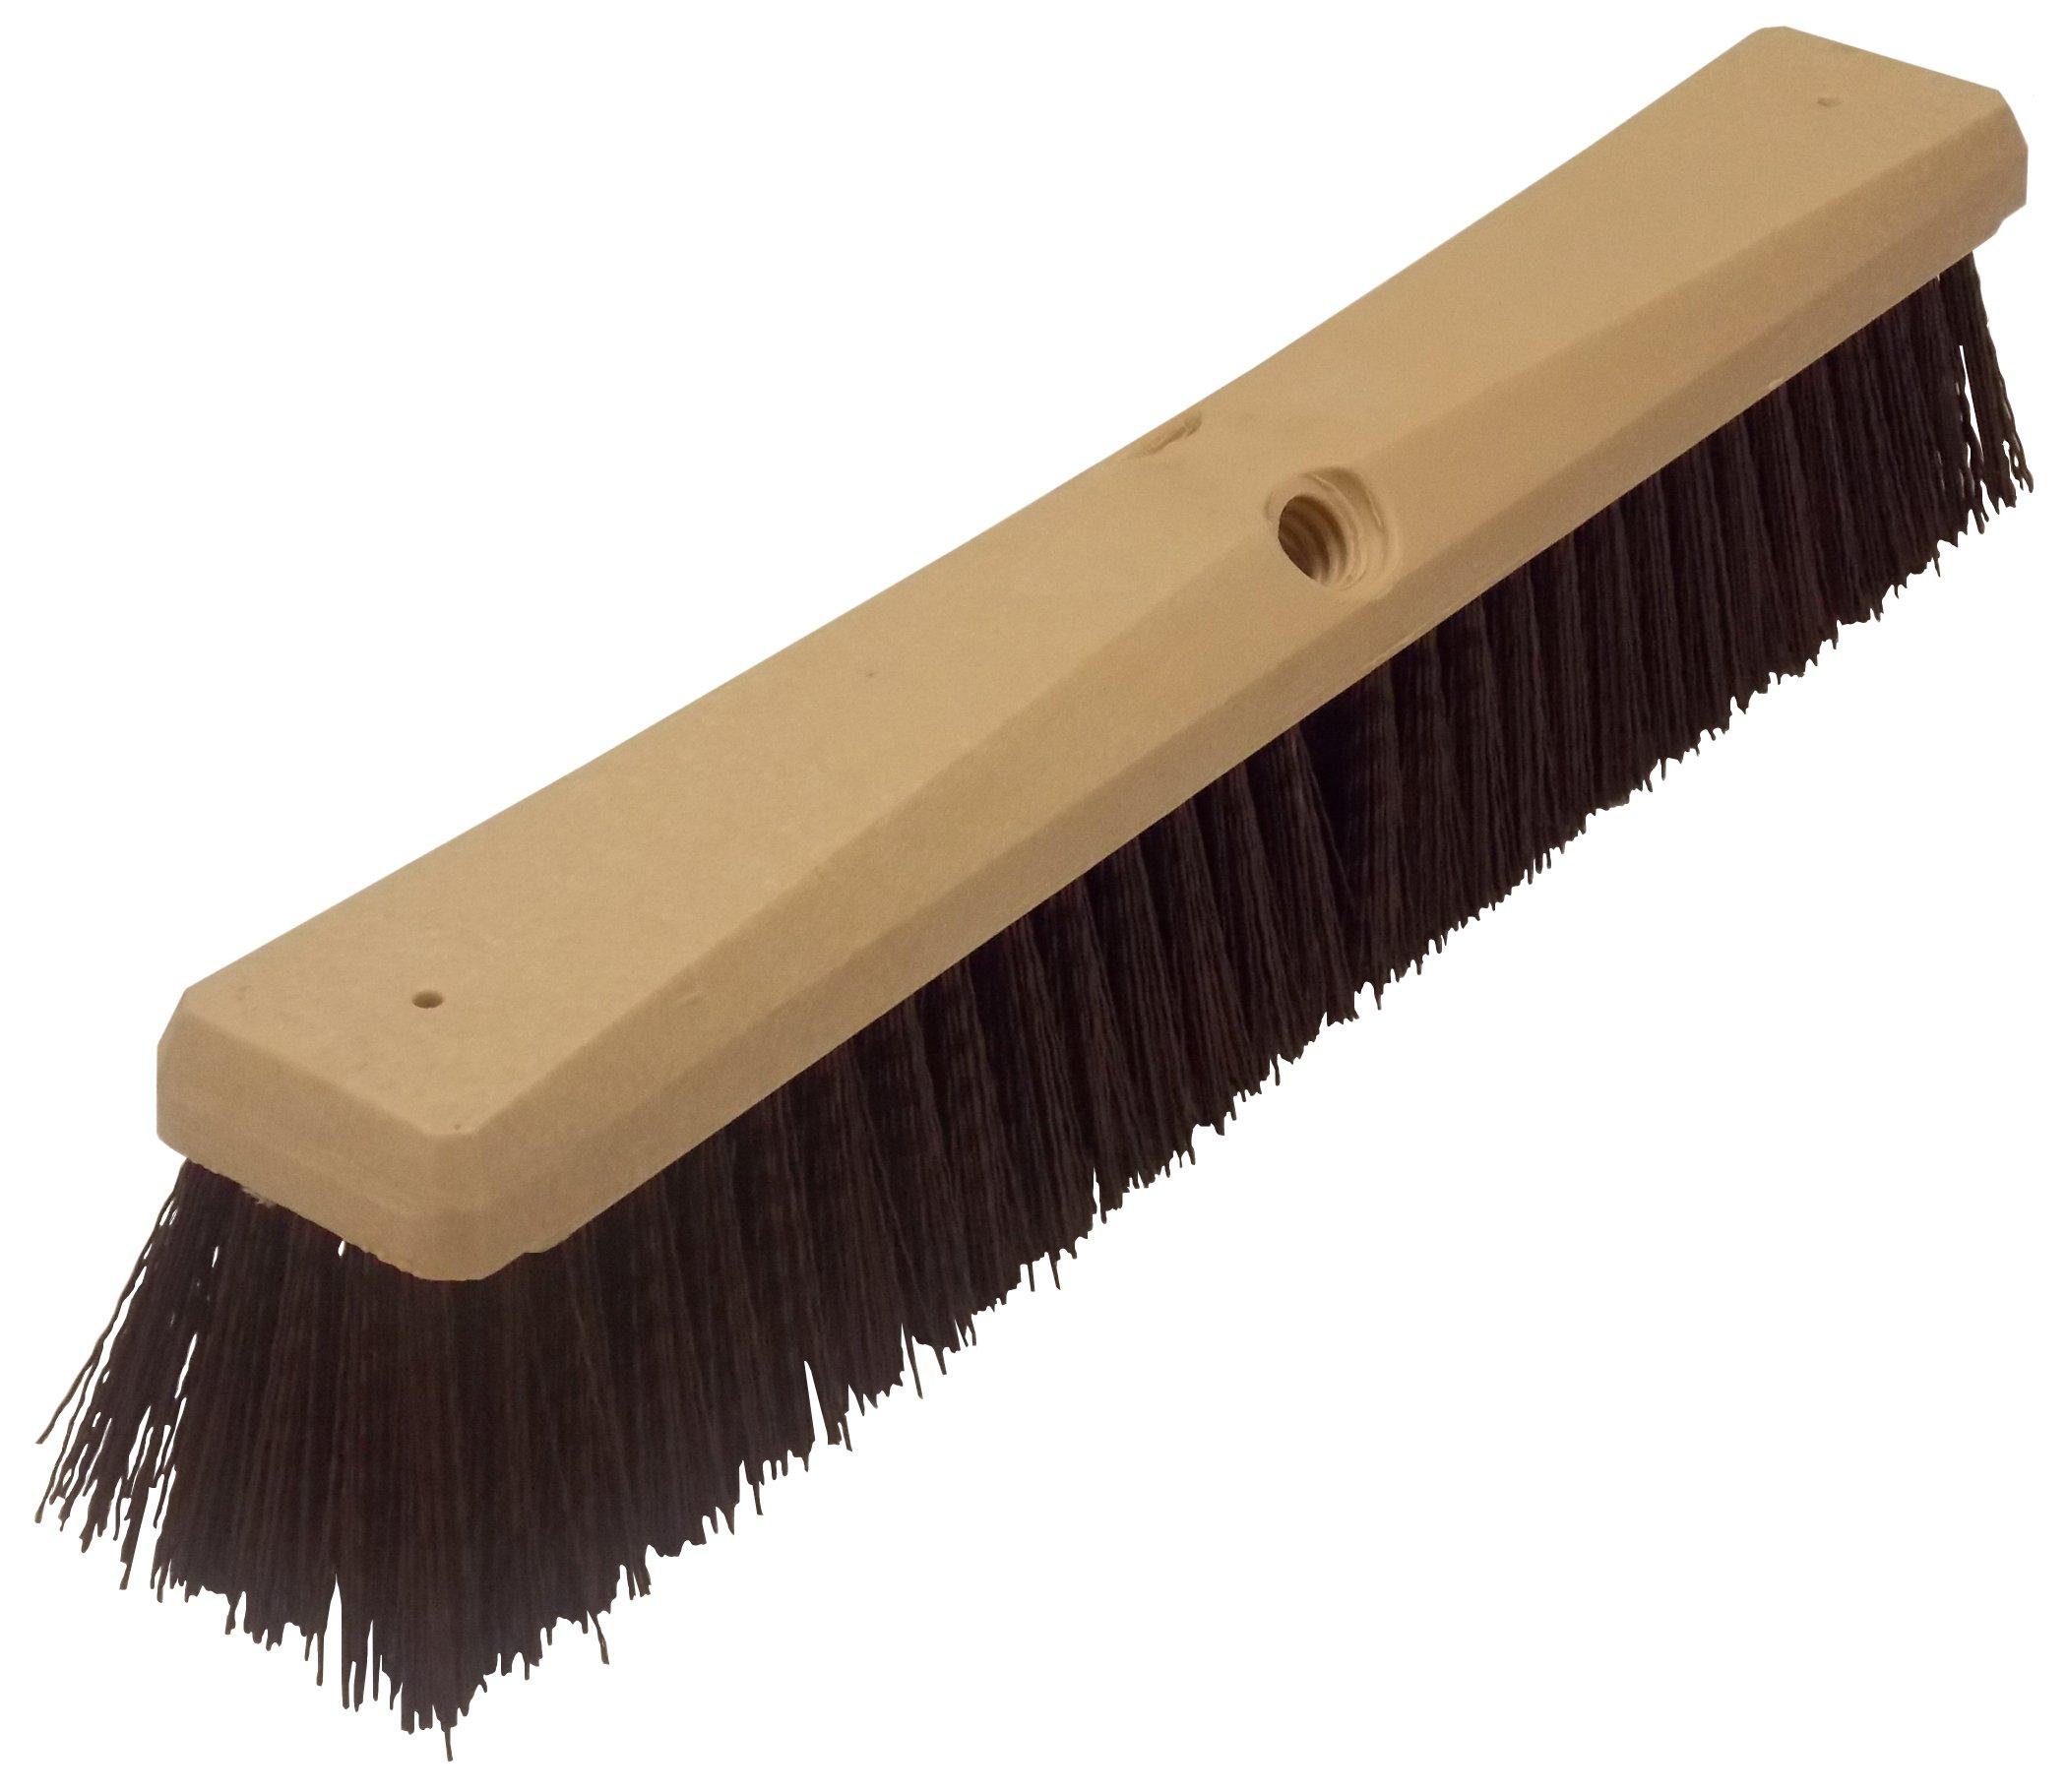 Wilen F103118, Crimped Polypropylene Garage Sweep, 18'' Foam Block, 3'' Bristle Trim (Case of 12)